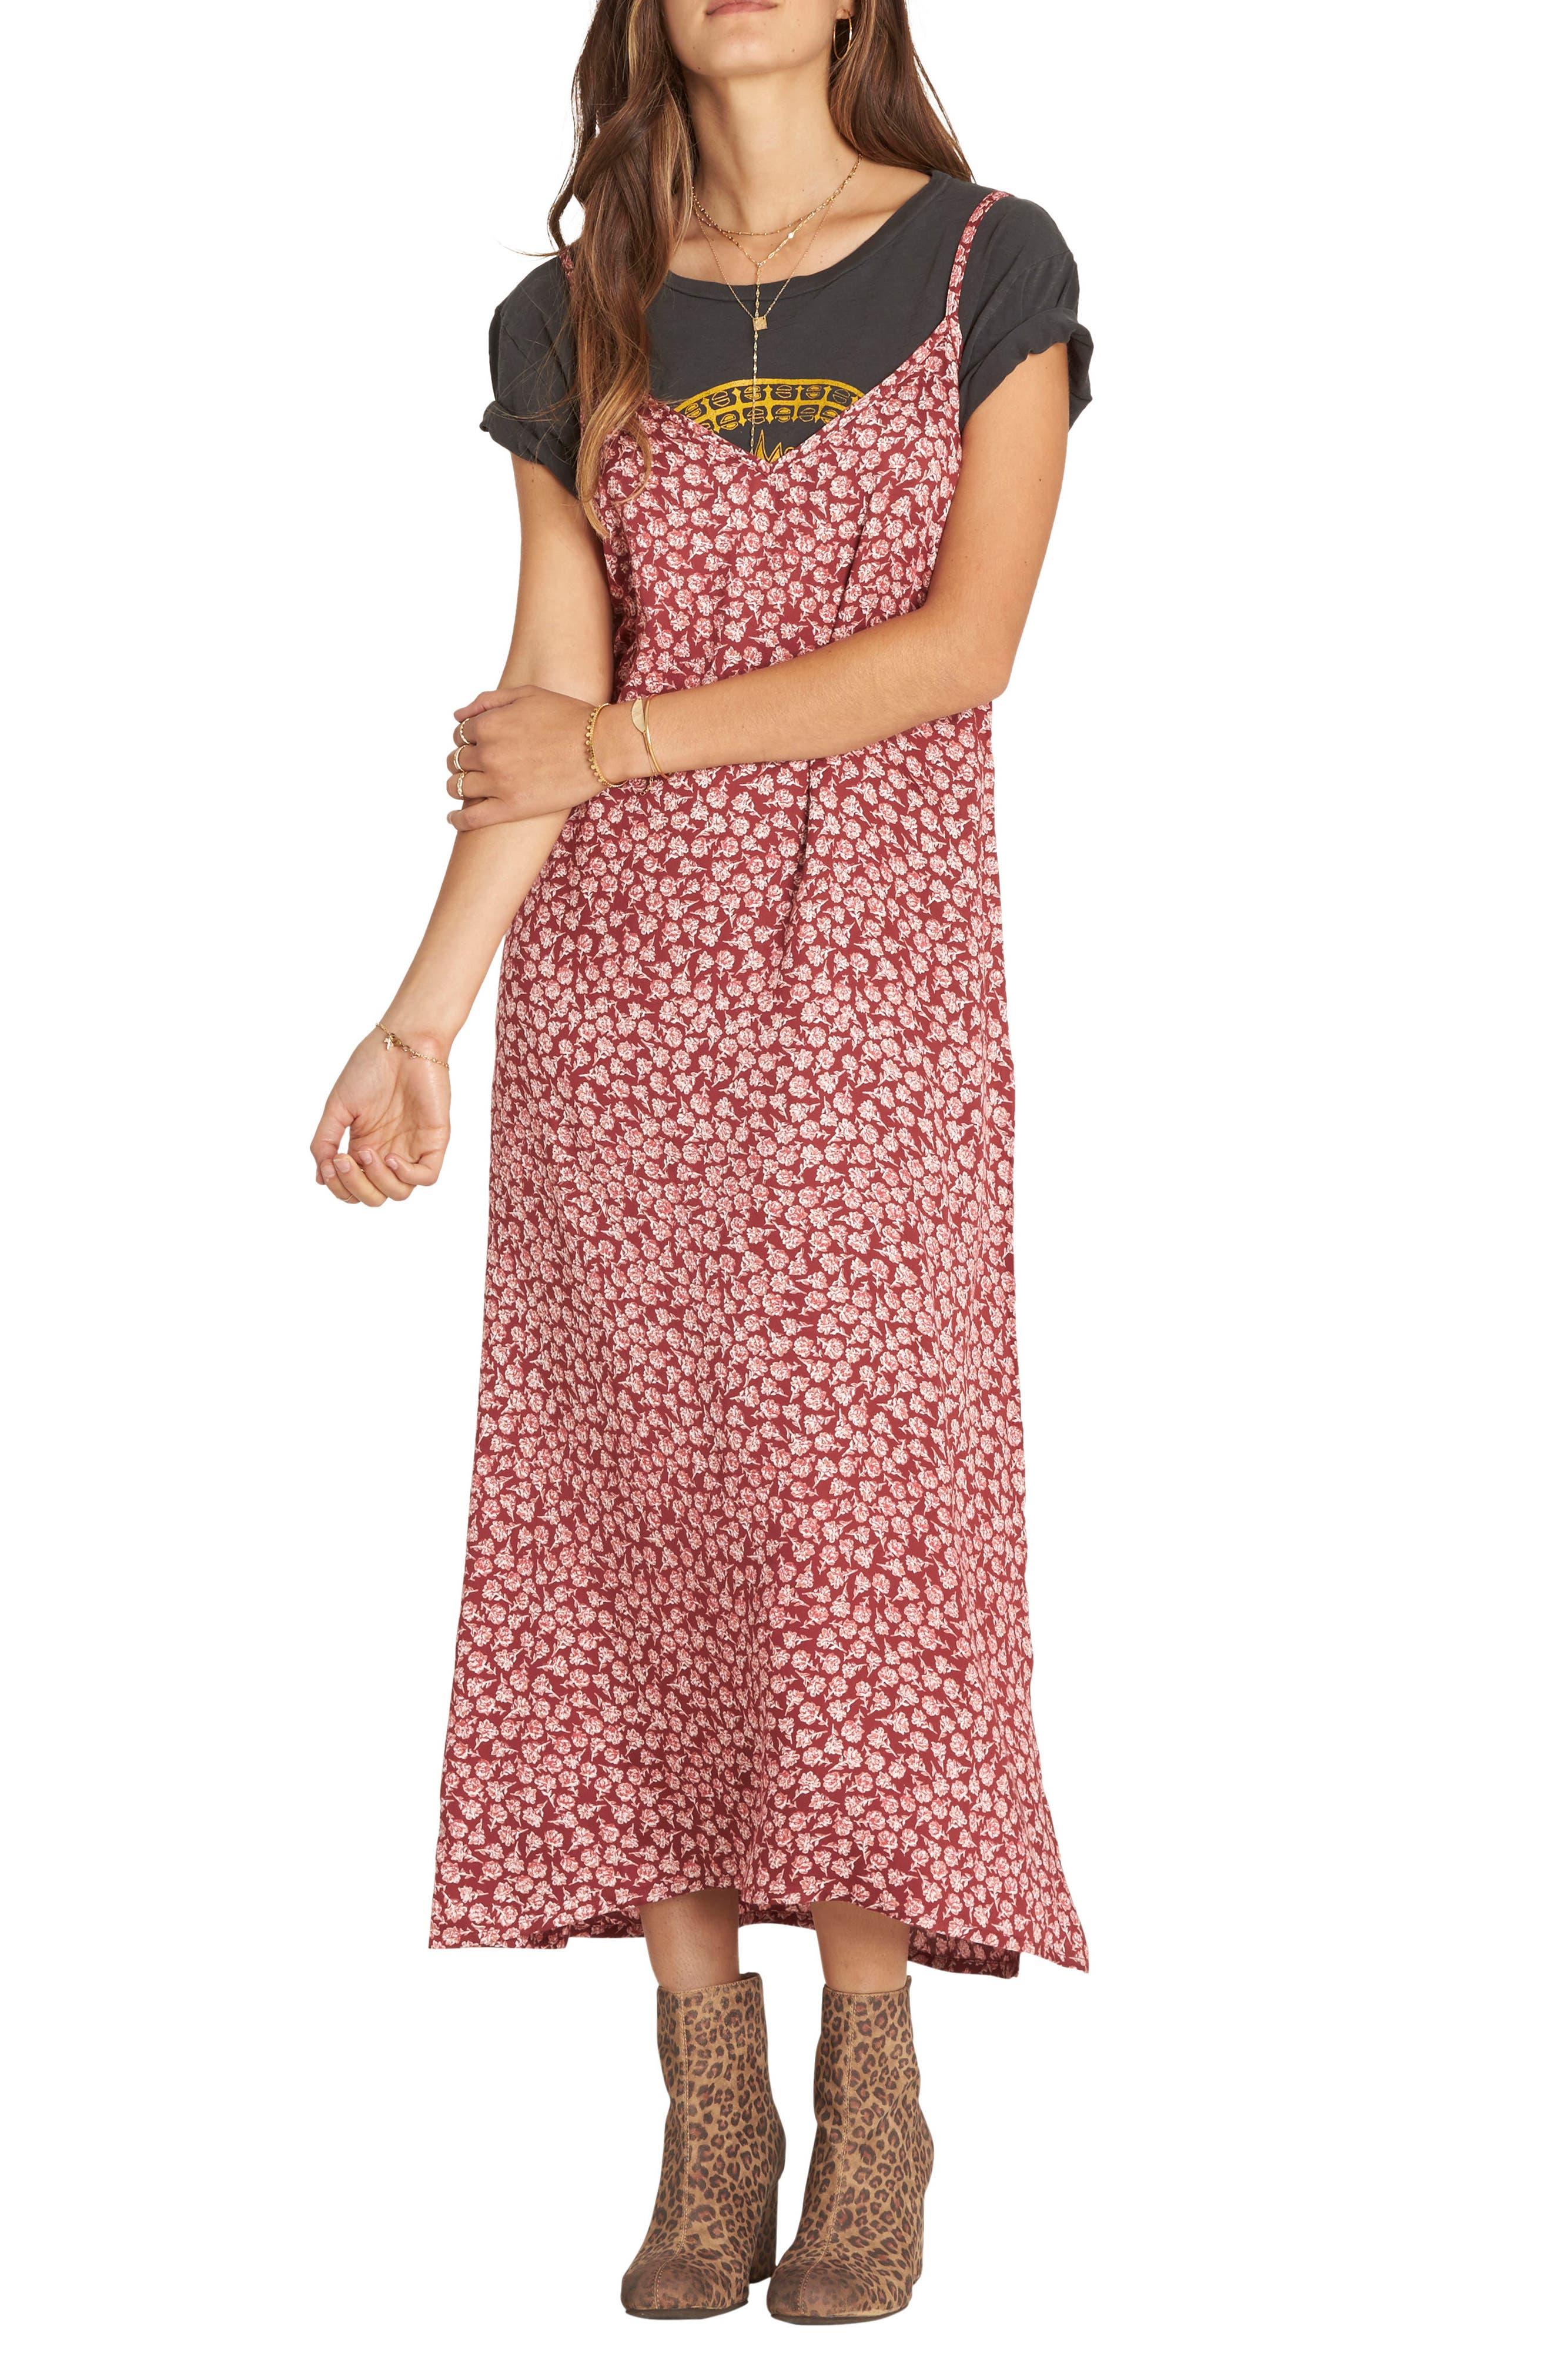 Dreamy Garden Print Dress,                             Main thumbnail 1, color,                             002